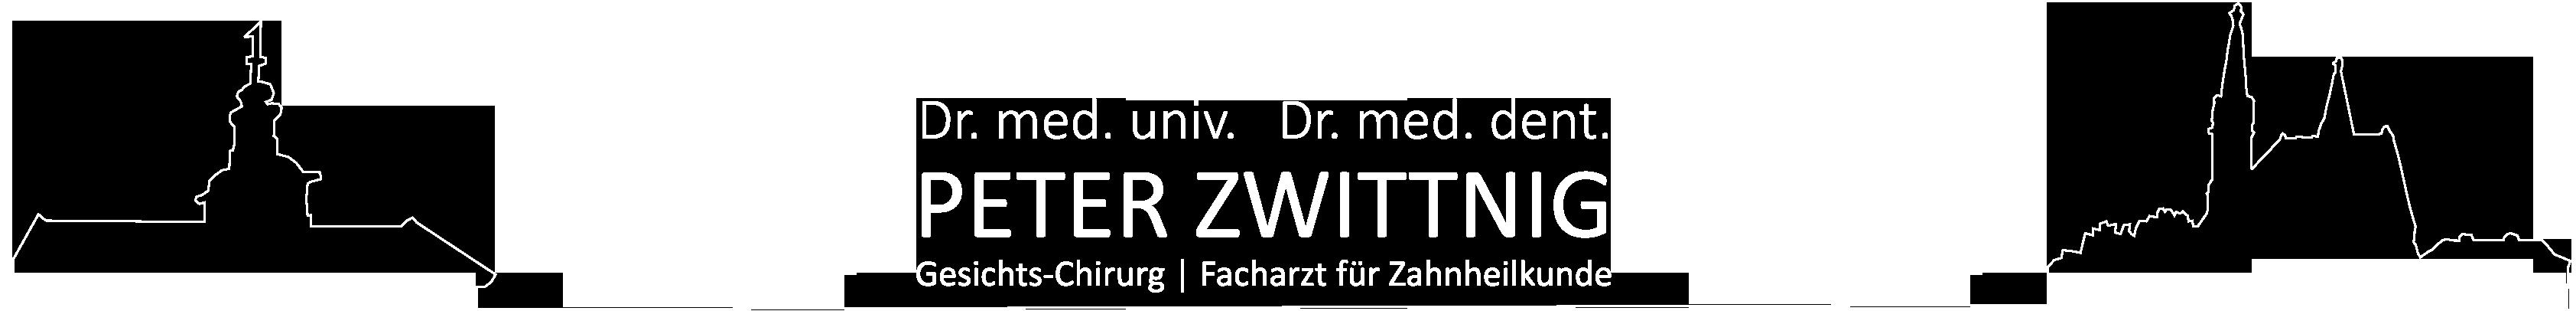 Dr. Peter Zwittnig, Wildon